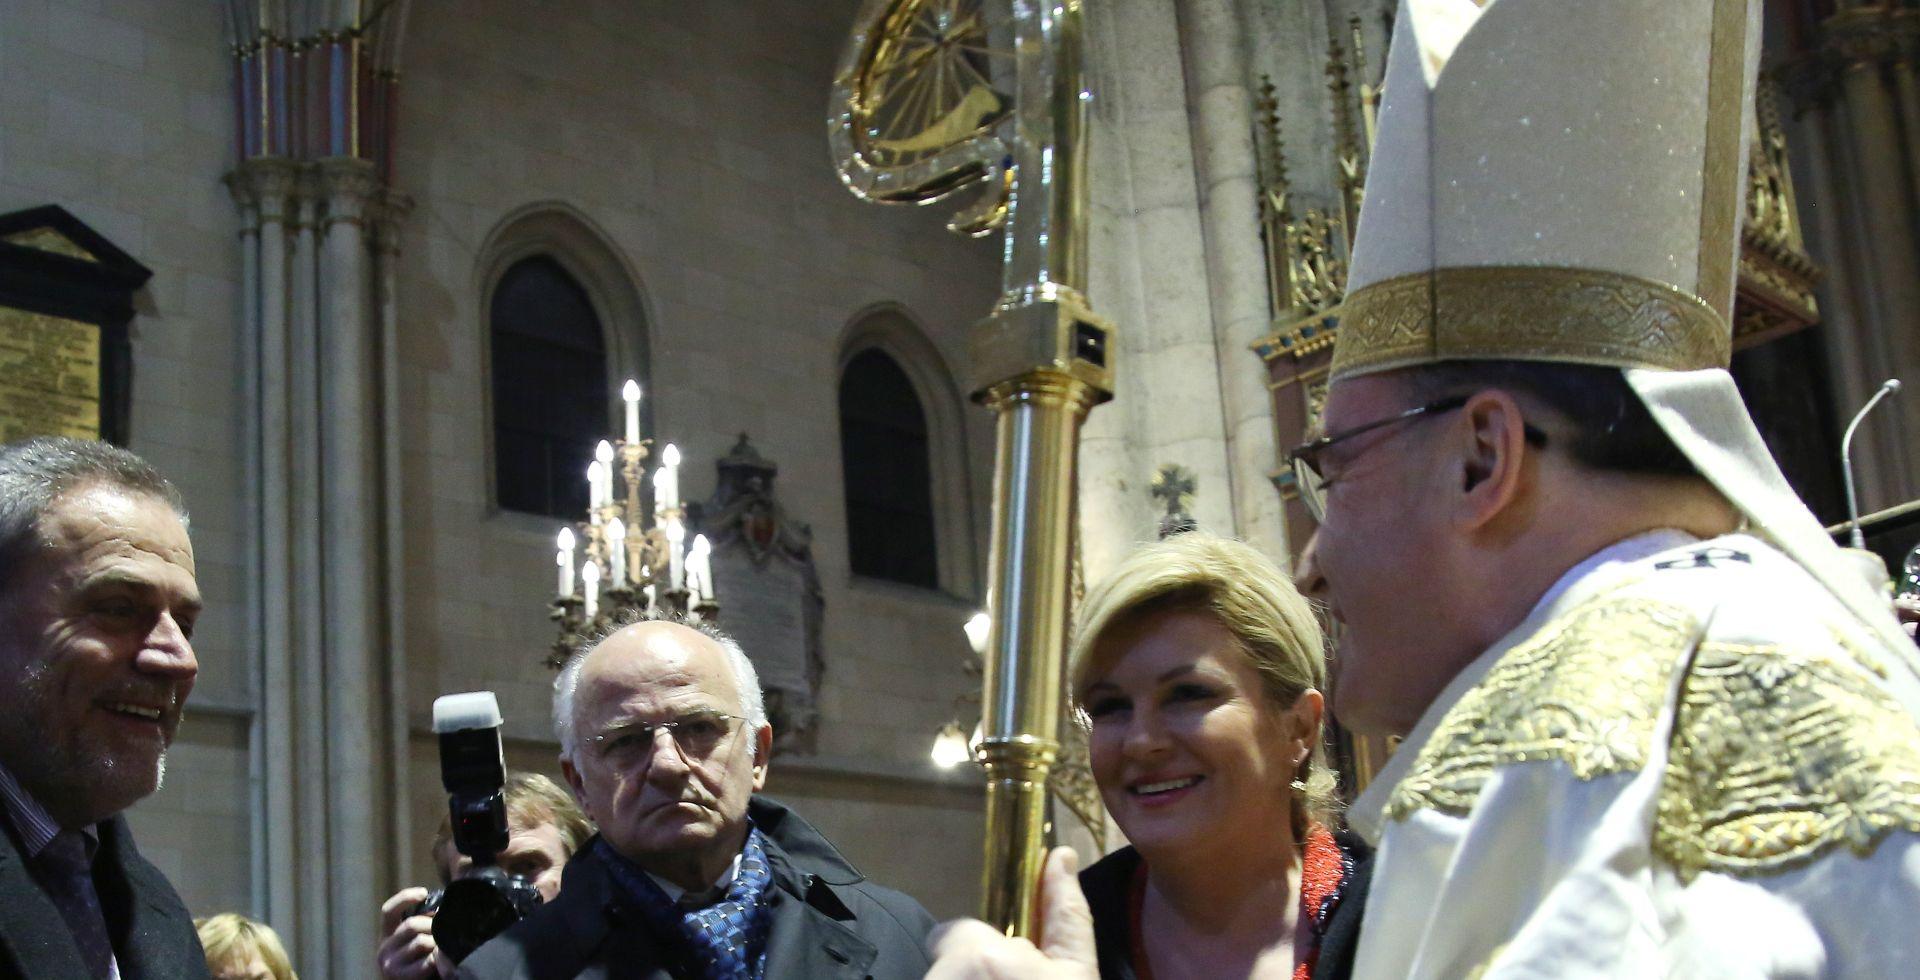 FOTO: Politički vrh na polnoćki u Zagrebačkoj katedrali